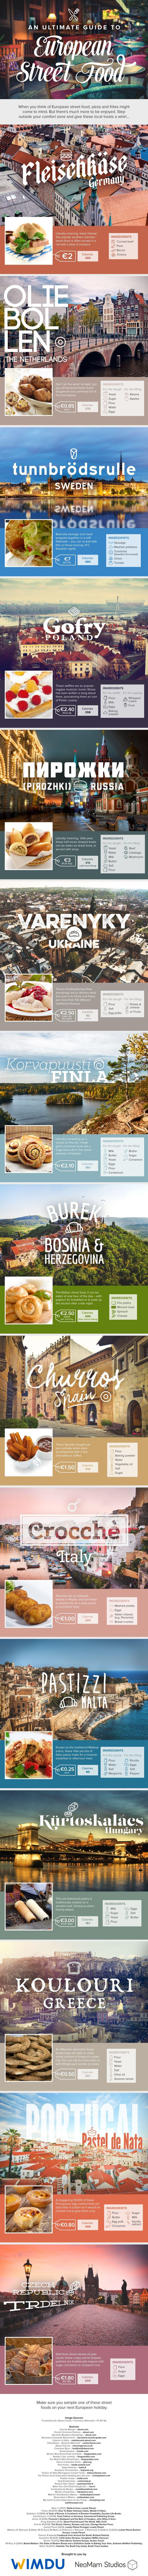 Euro Street Food Infographic